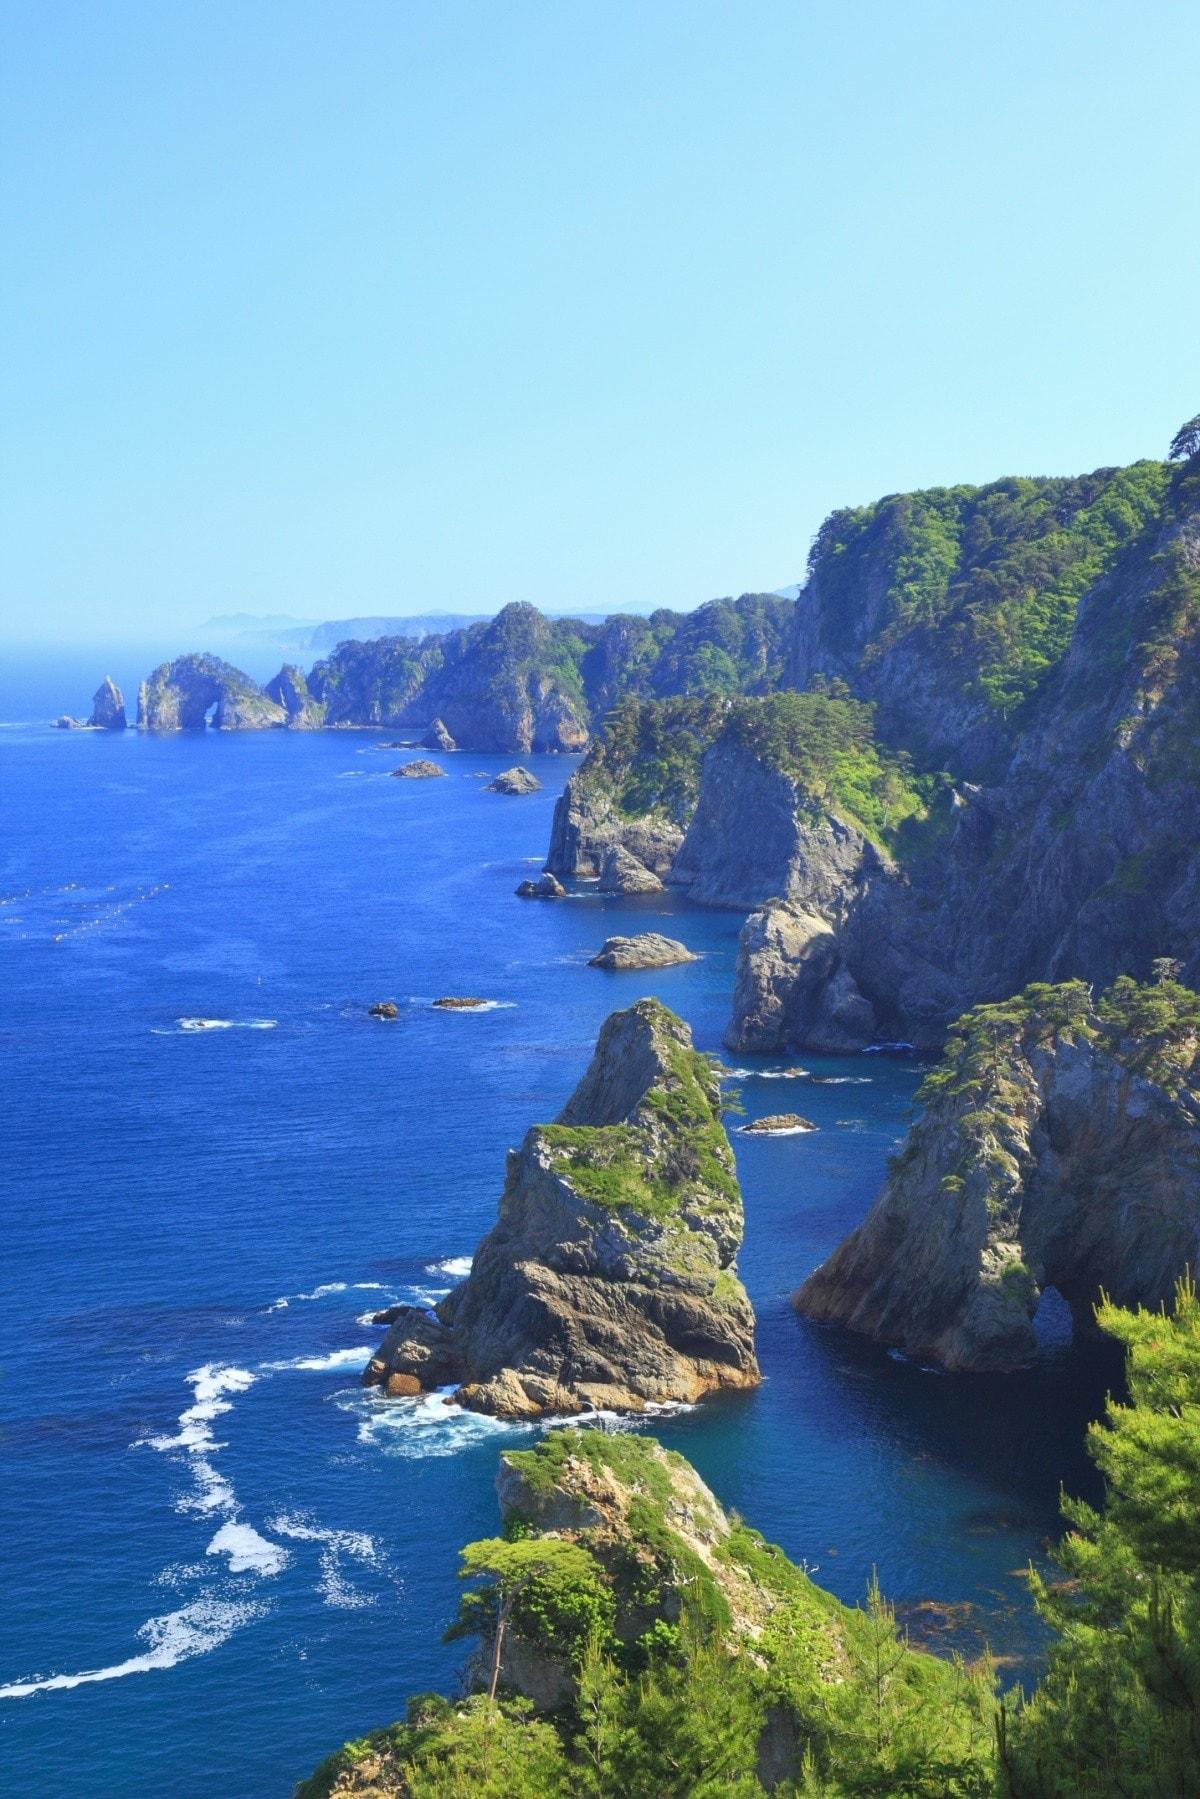 16. Sanriku Coast (Aomori, Iwate & Miyagi)